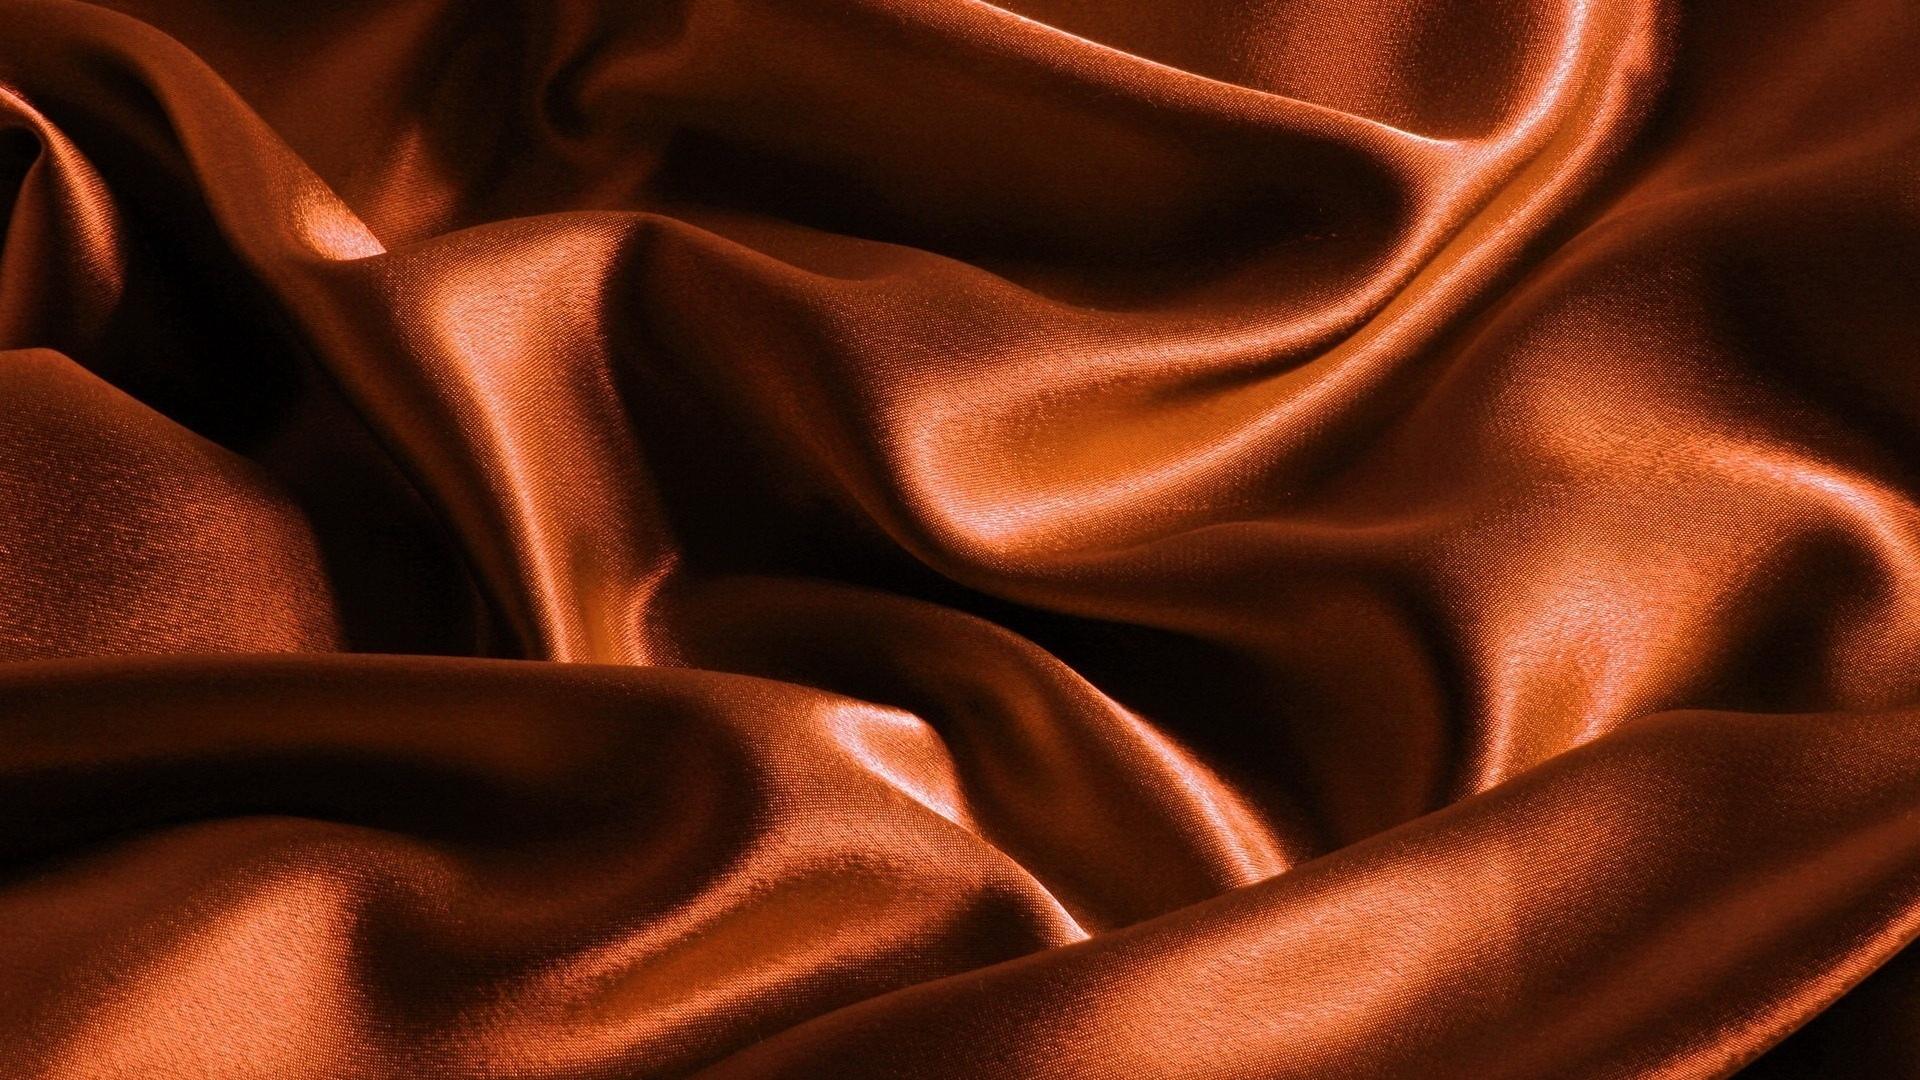 Оранжевый ткань атлас фон текстура